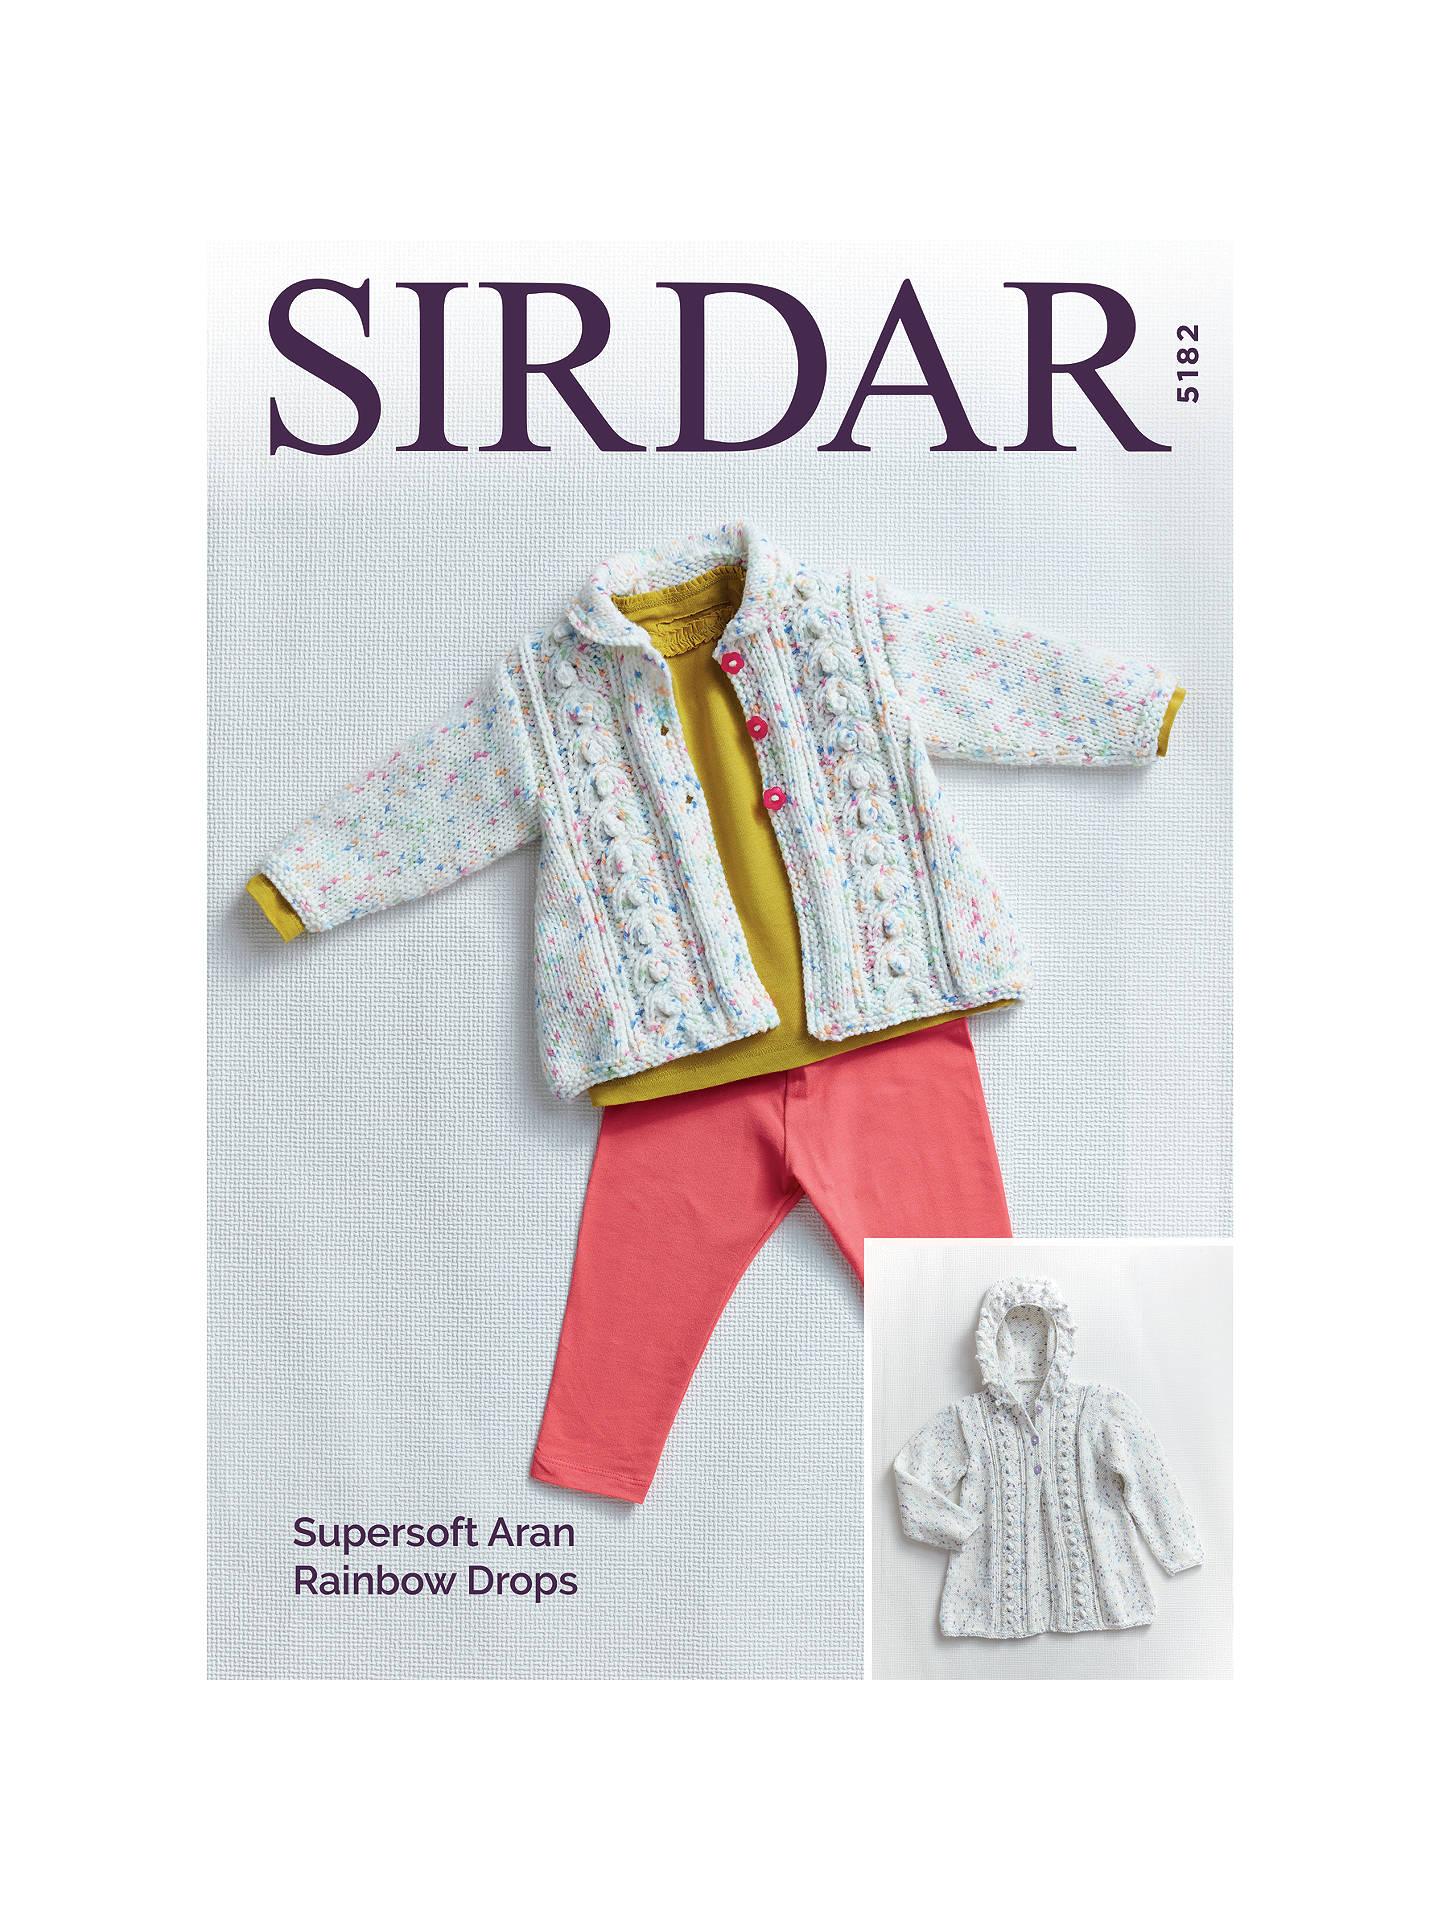 dbdf54bba5db Sirdar Rainbow Drops Aran Baby Cardigans Knitting Pattern